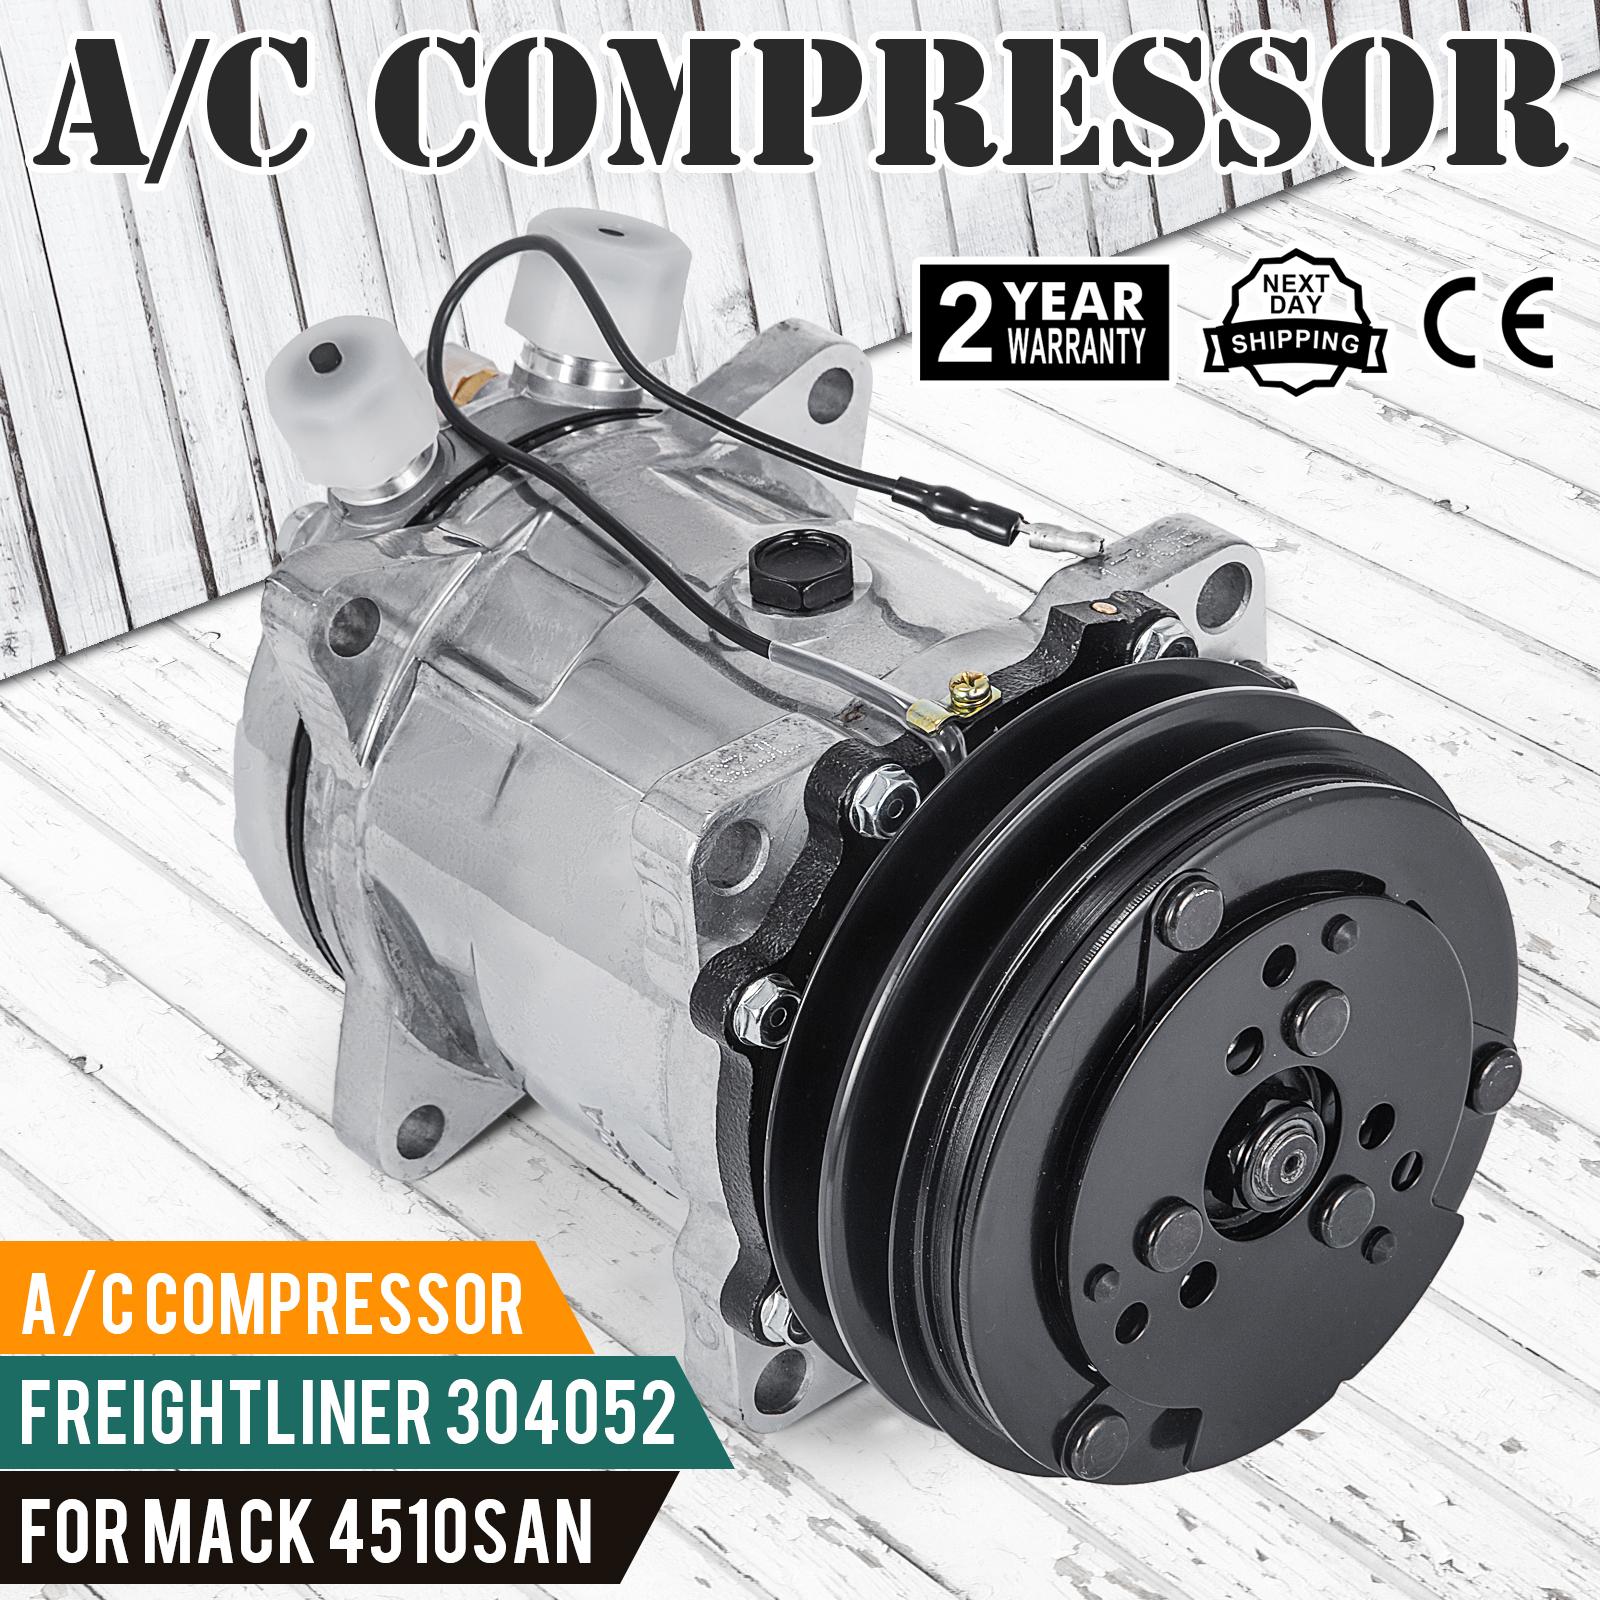 Details about AC Compressor for Sanden SD508 ABPN83304052  9285,9515,9694,SD5H14,CO 4510C